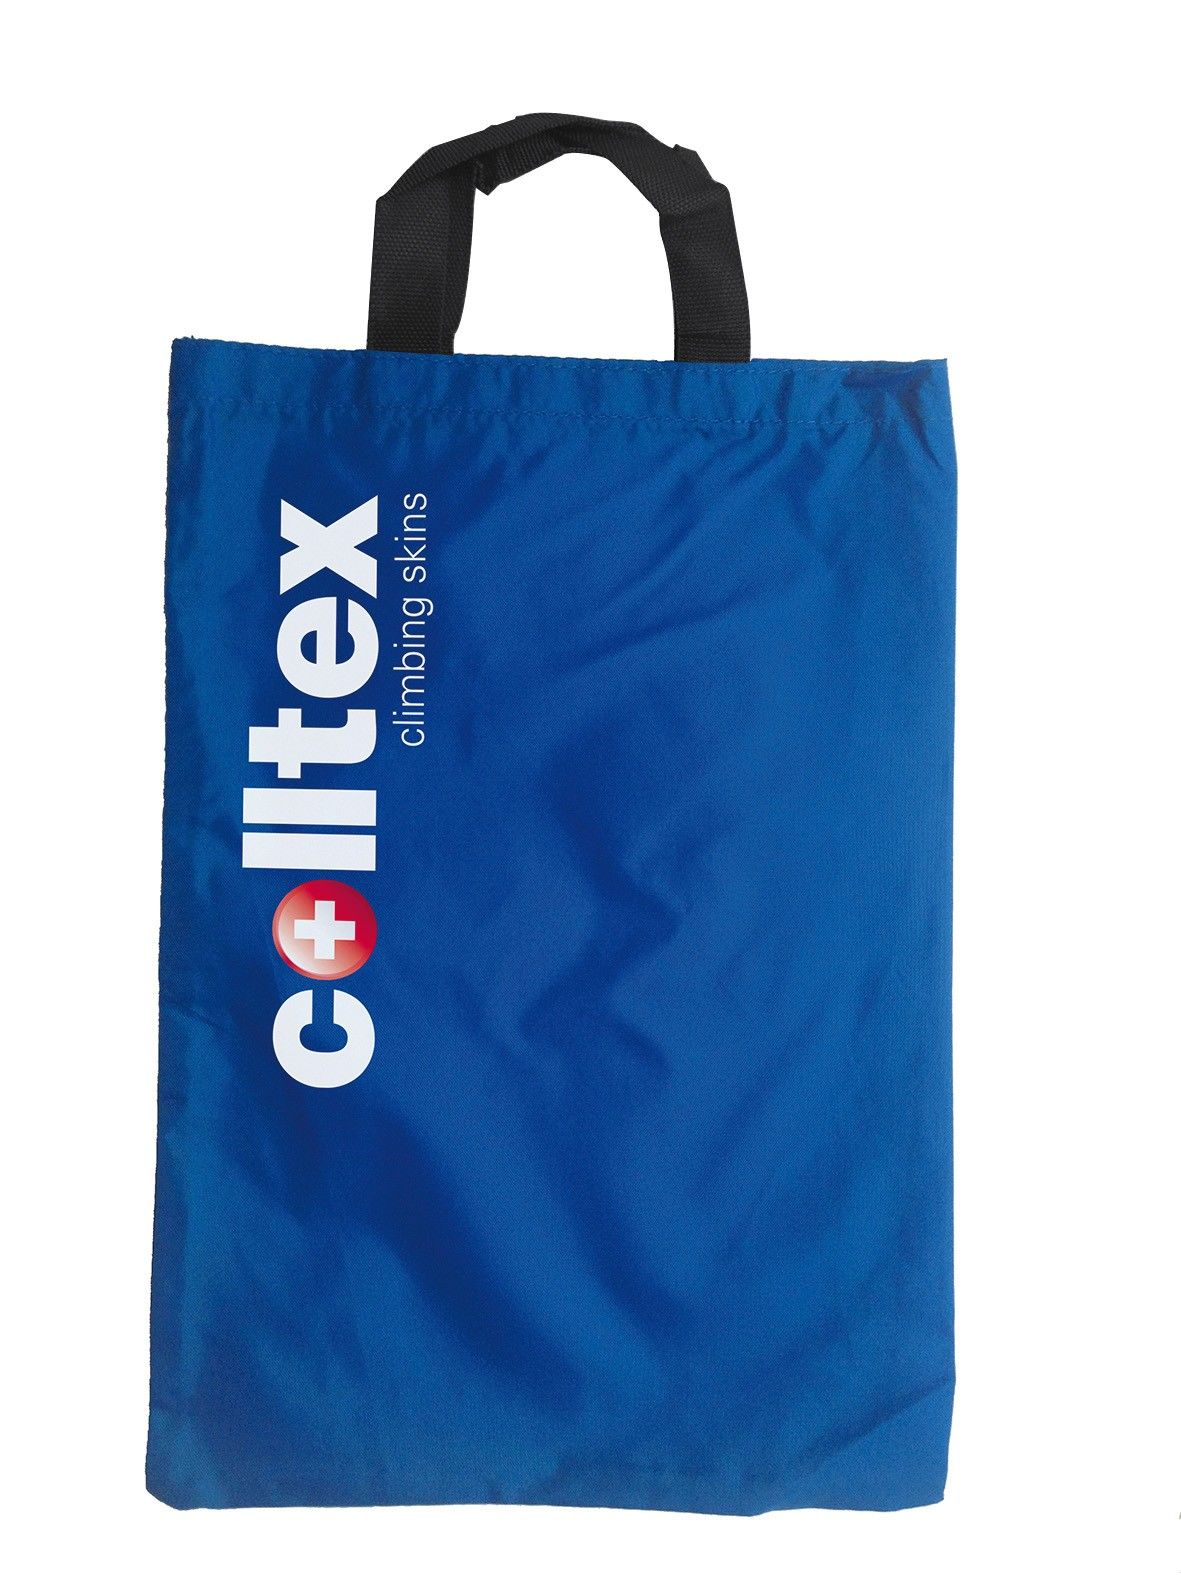 Colltex Fellbeutel Blau, Ski & Tourenski, One Size